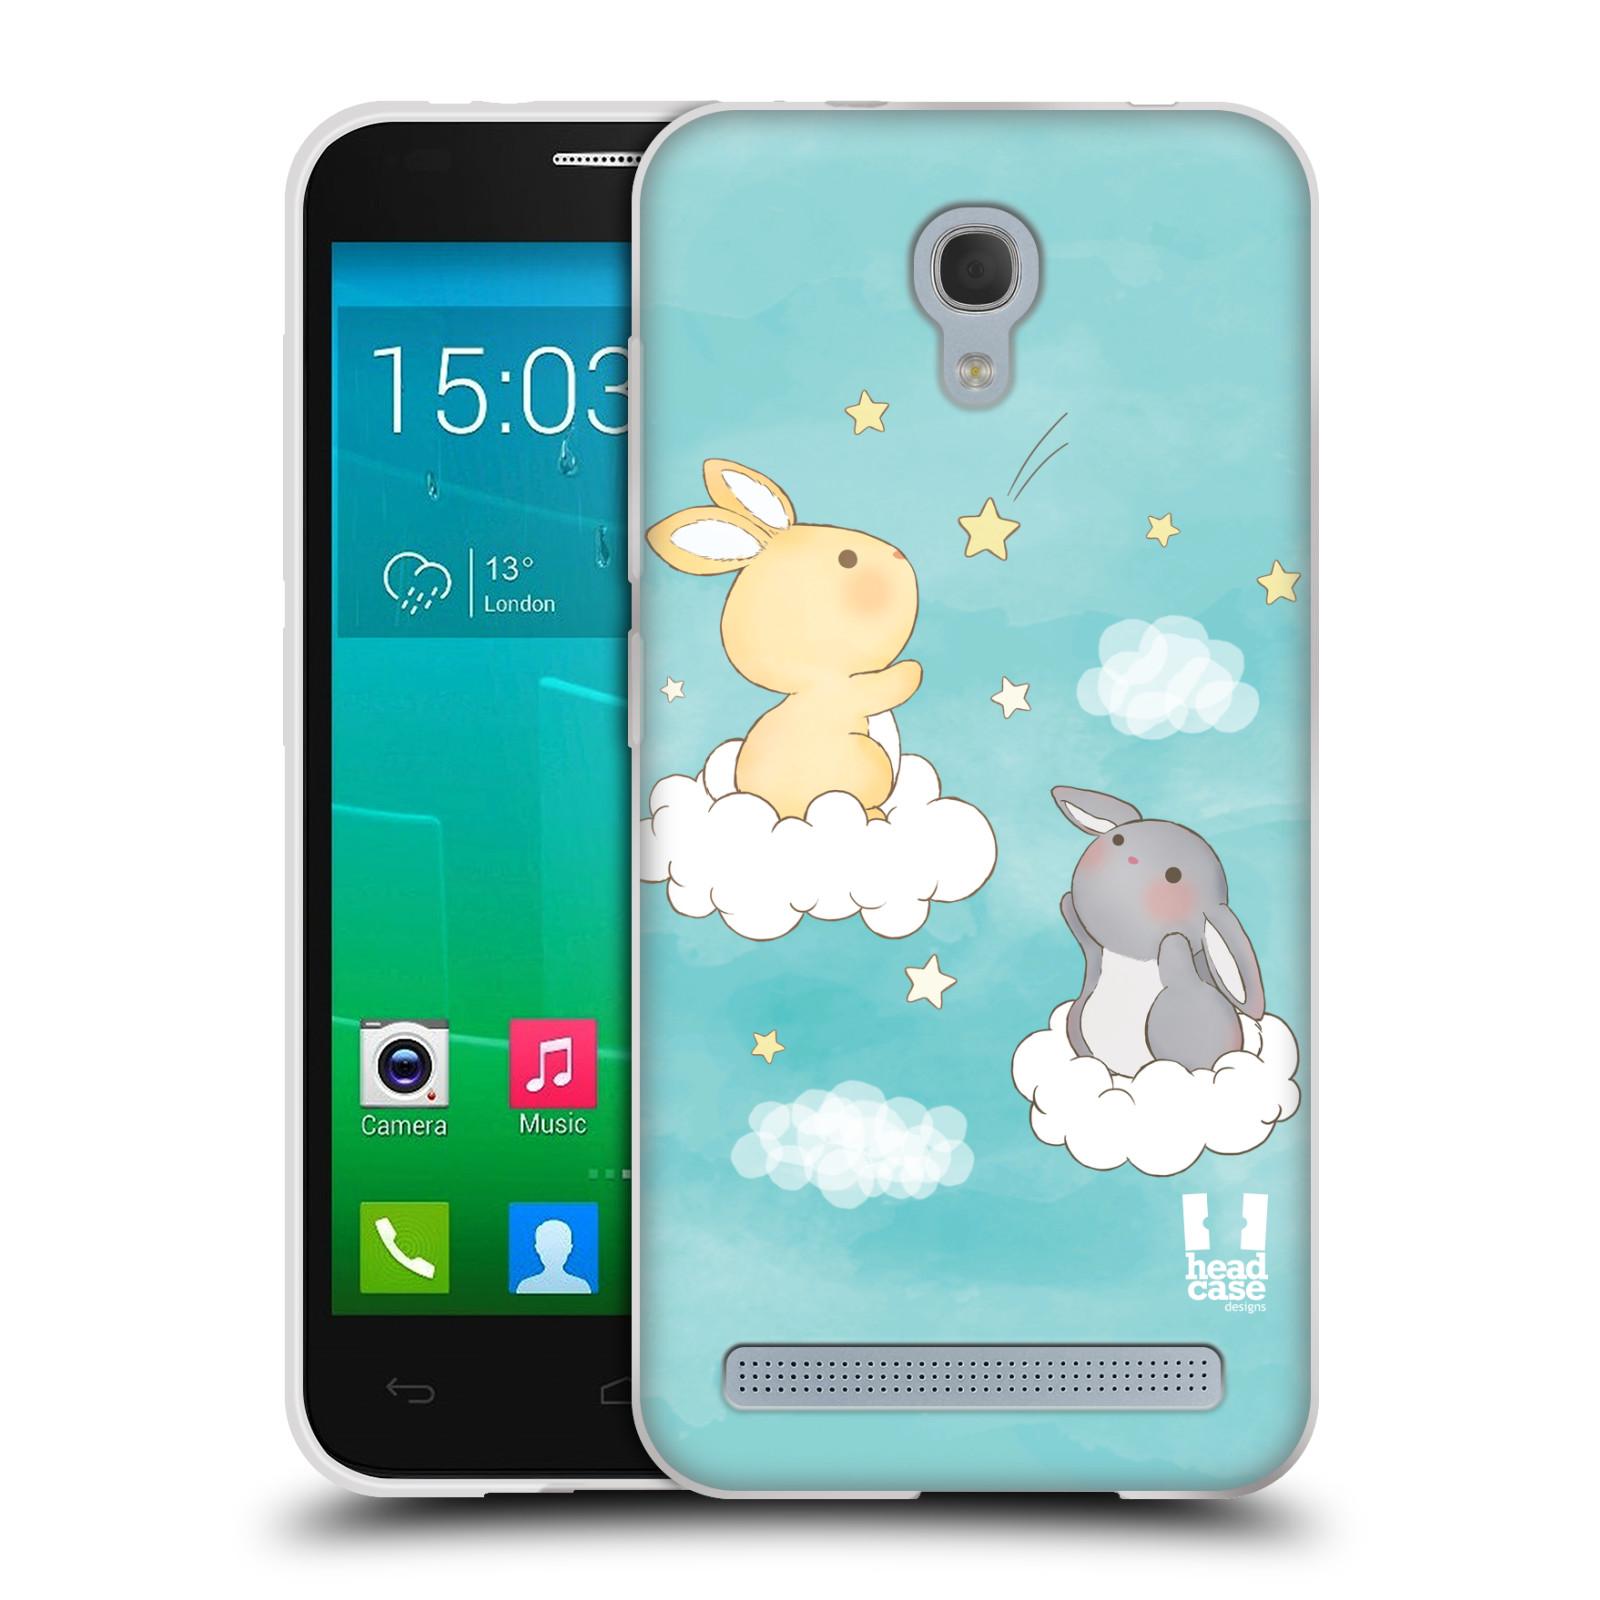 HEAD CASE silikonový obal na mobil Alcatel Idol 2 MINI S 6036Y vzor králíček a hvězdy modrá